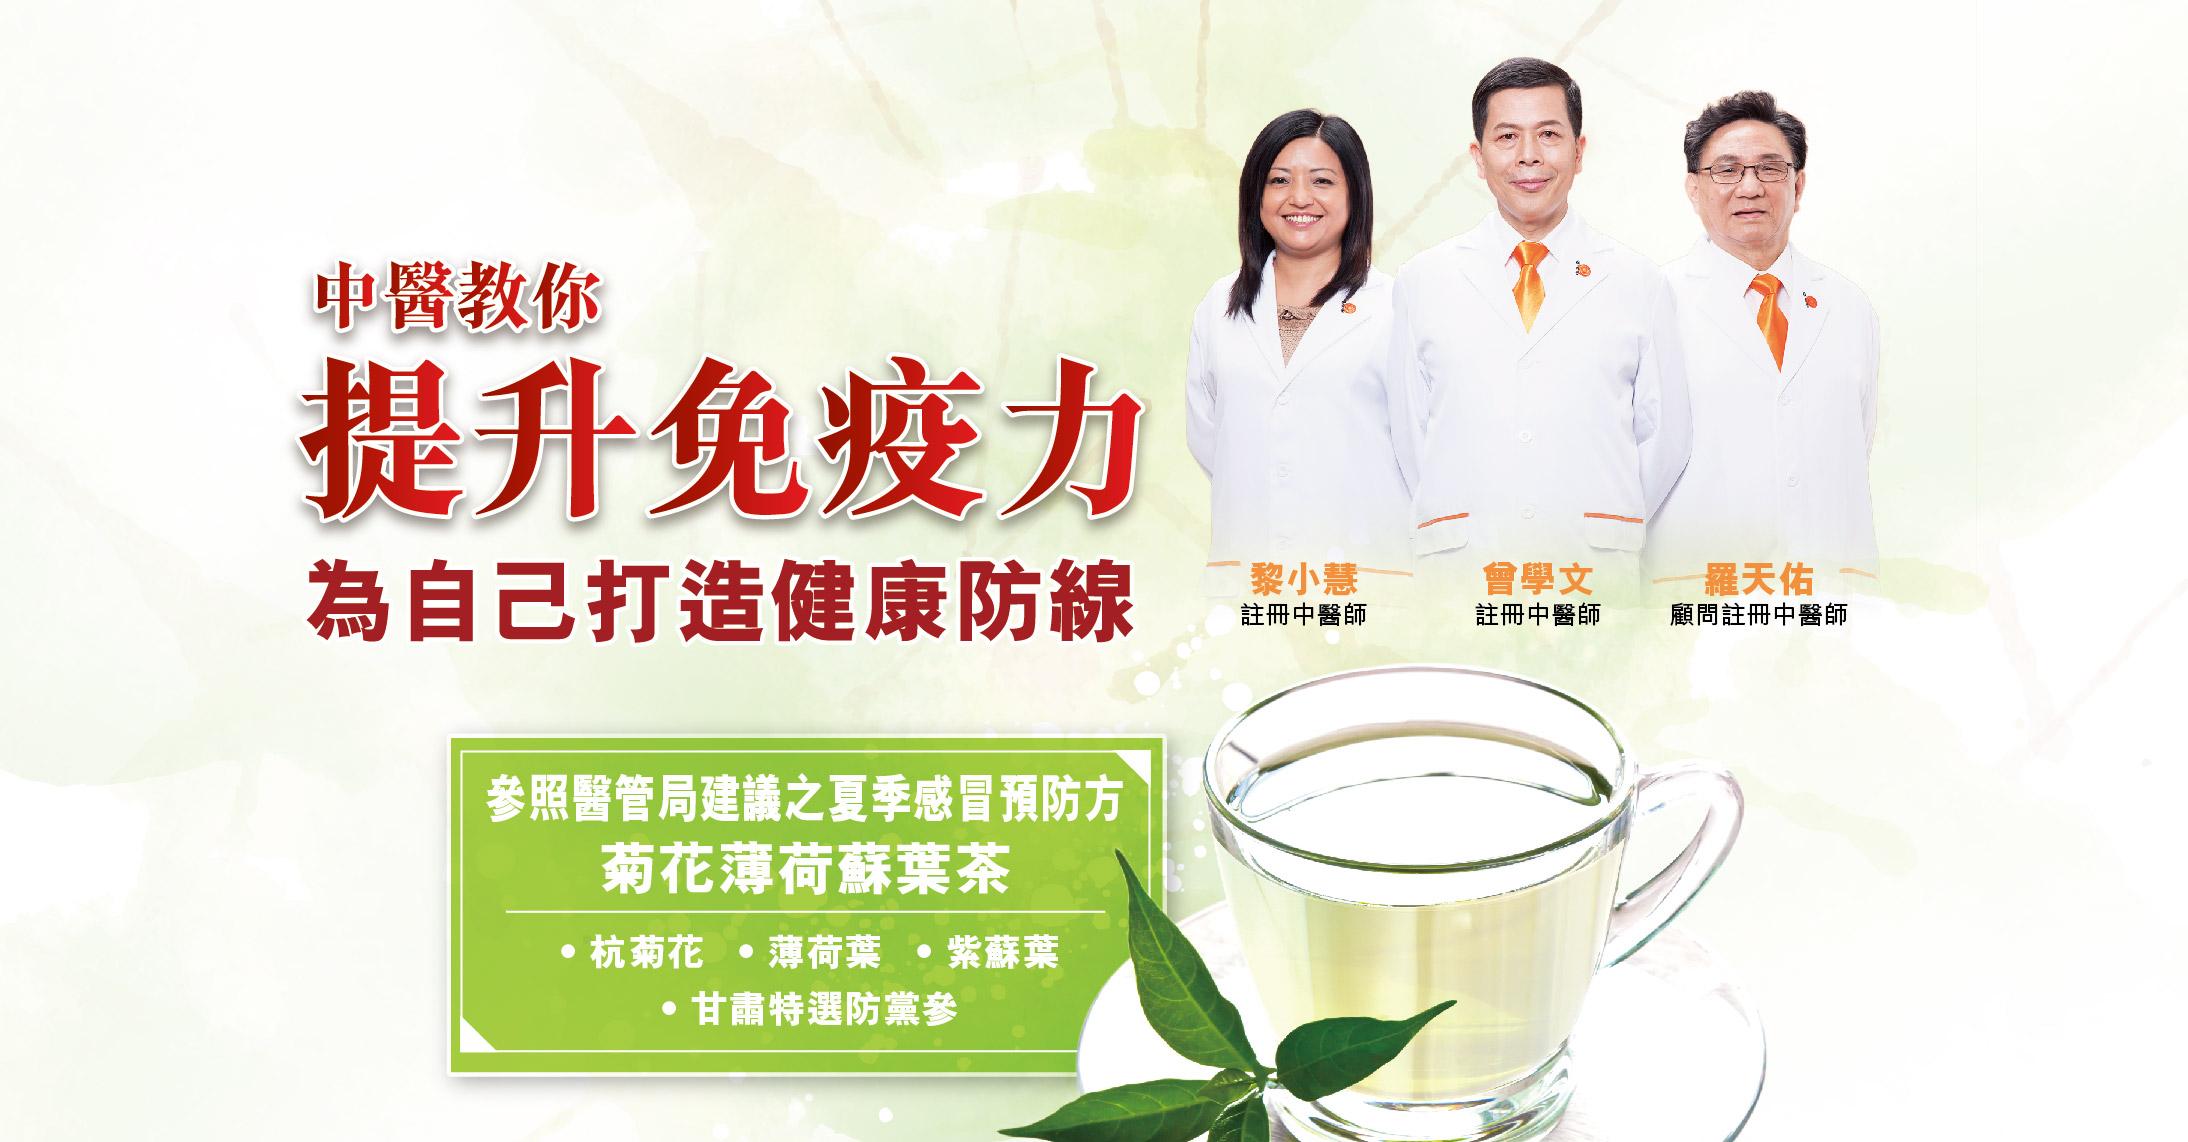 Chinese Medicine: Immunity Enhancement